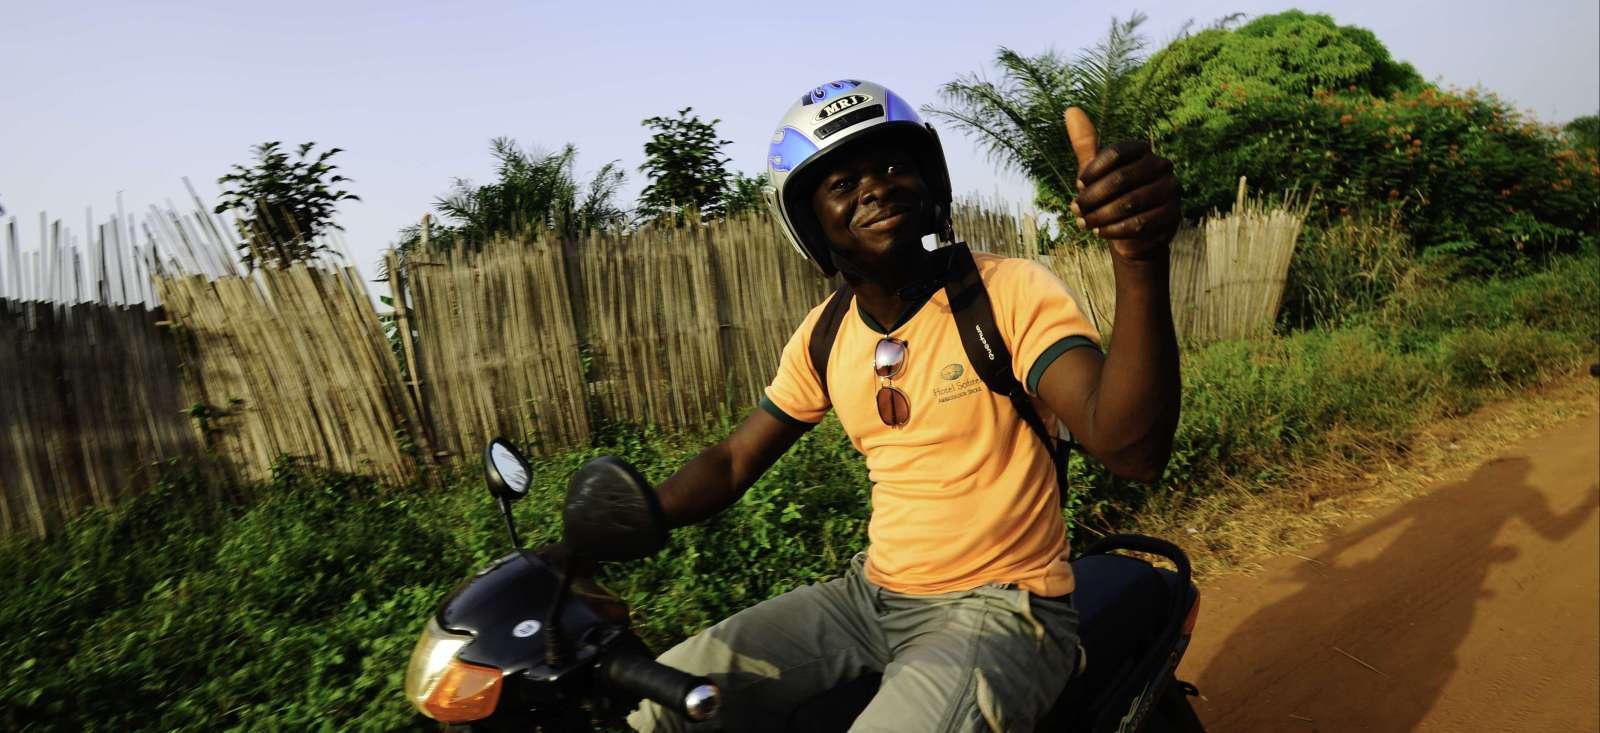 Voyage à moto : Panorama \